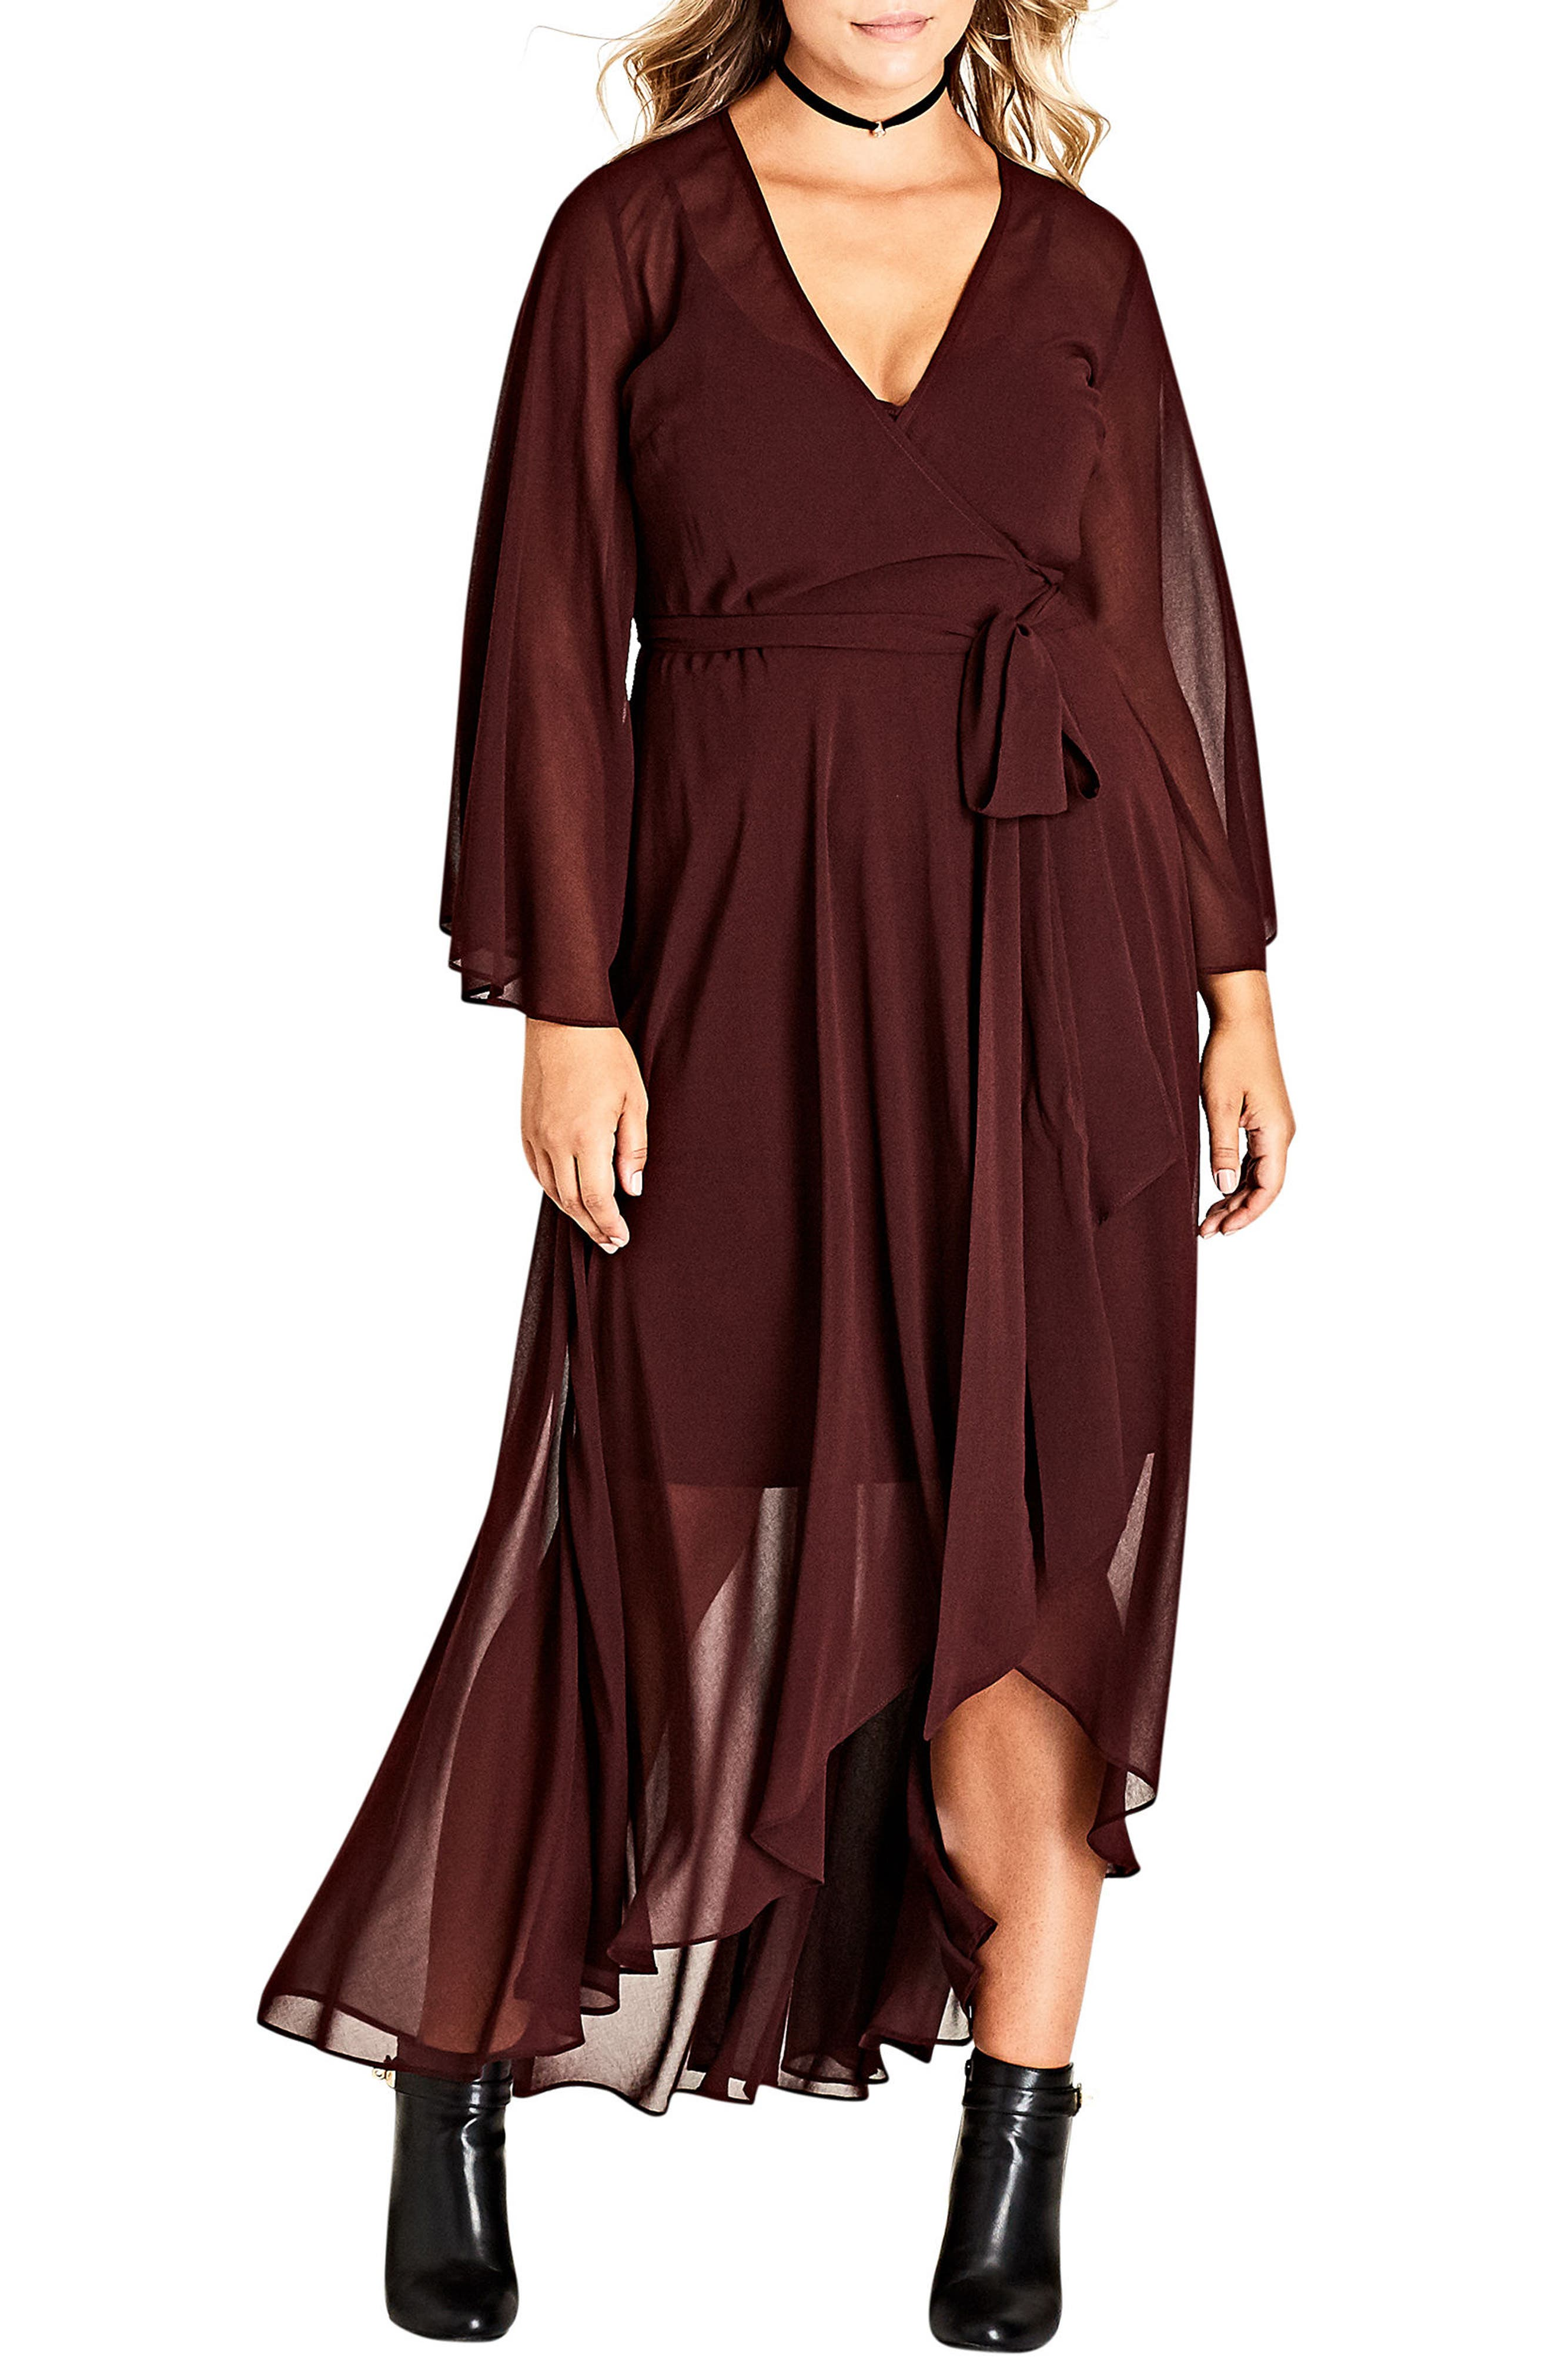 City Chic 'Fleetwood' Maxi Dress (Plus Size)